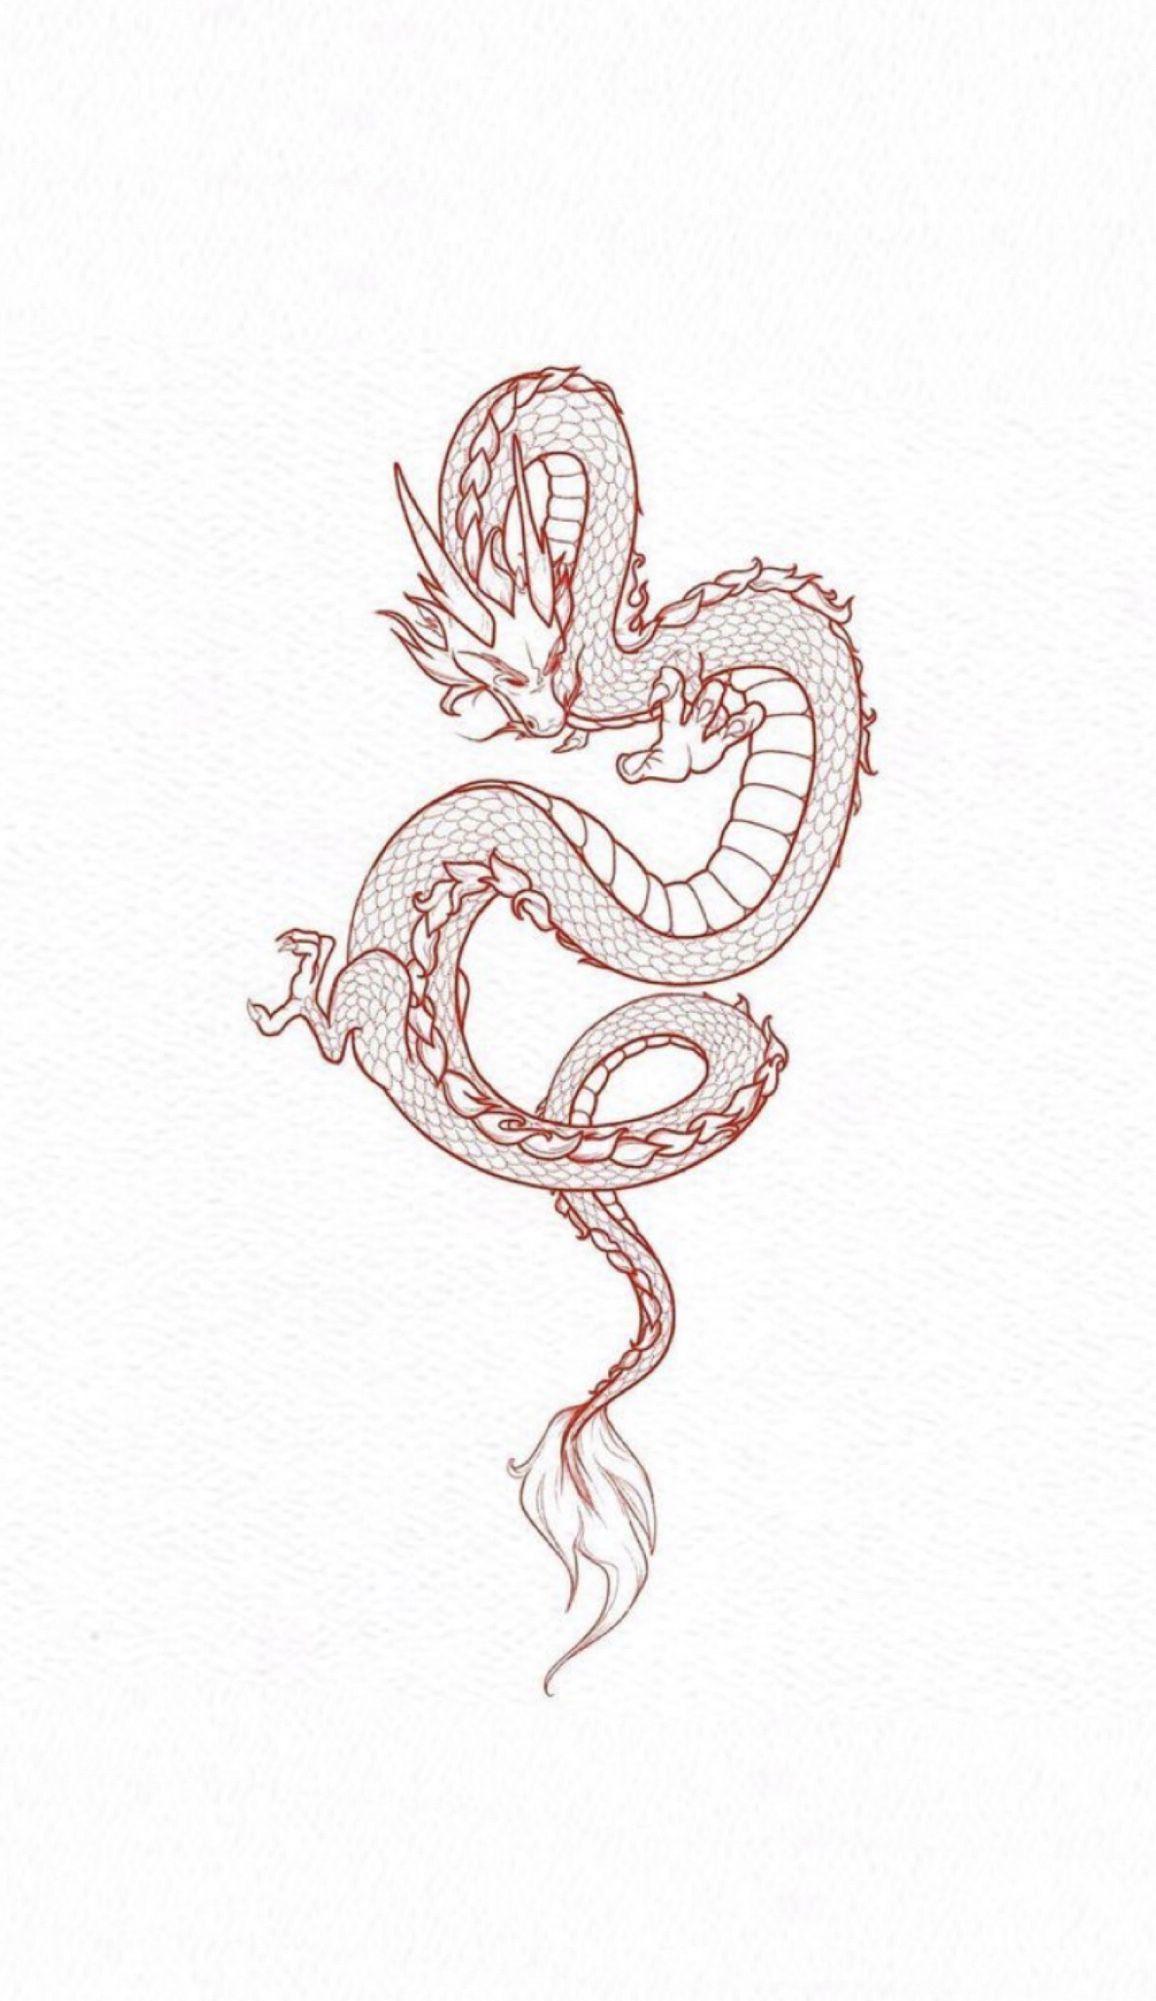 Dragon V 2020 G Krasnye Tatuirovki Tatuirovki Tatuirovki Kitajskogo Drakona